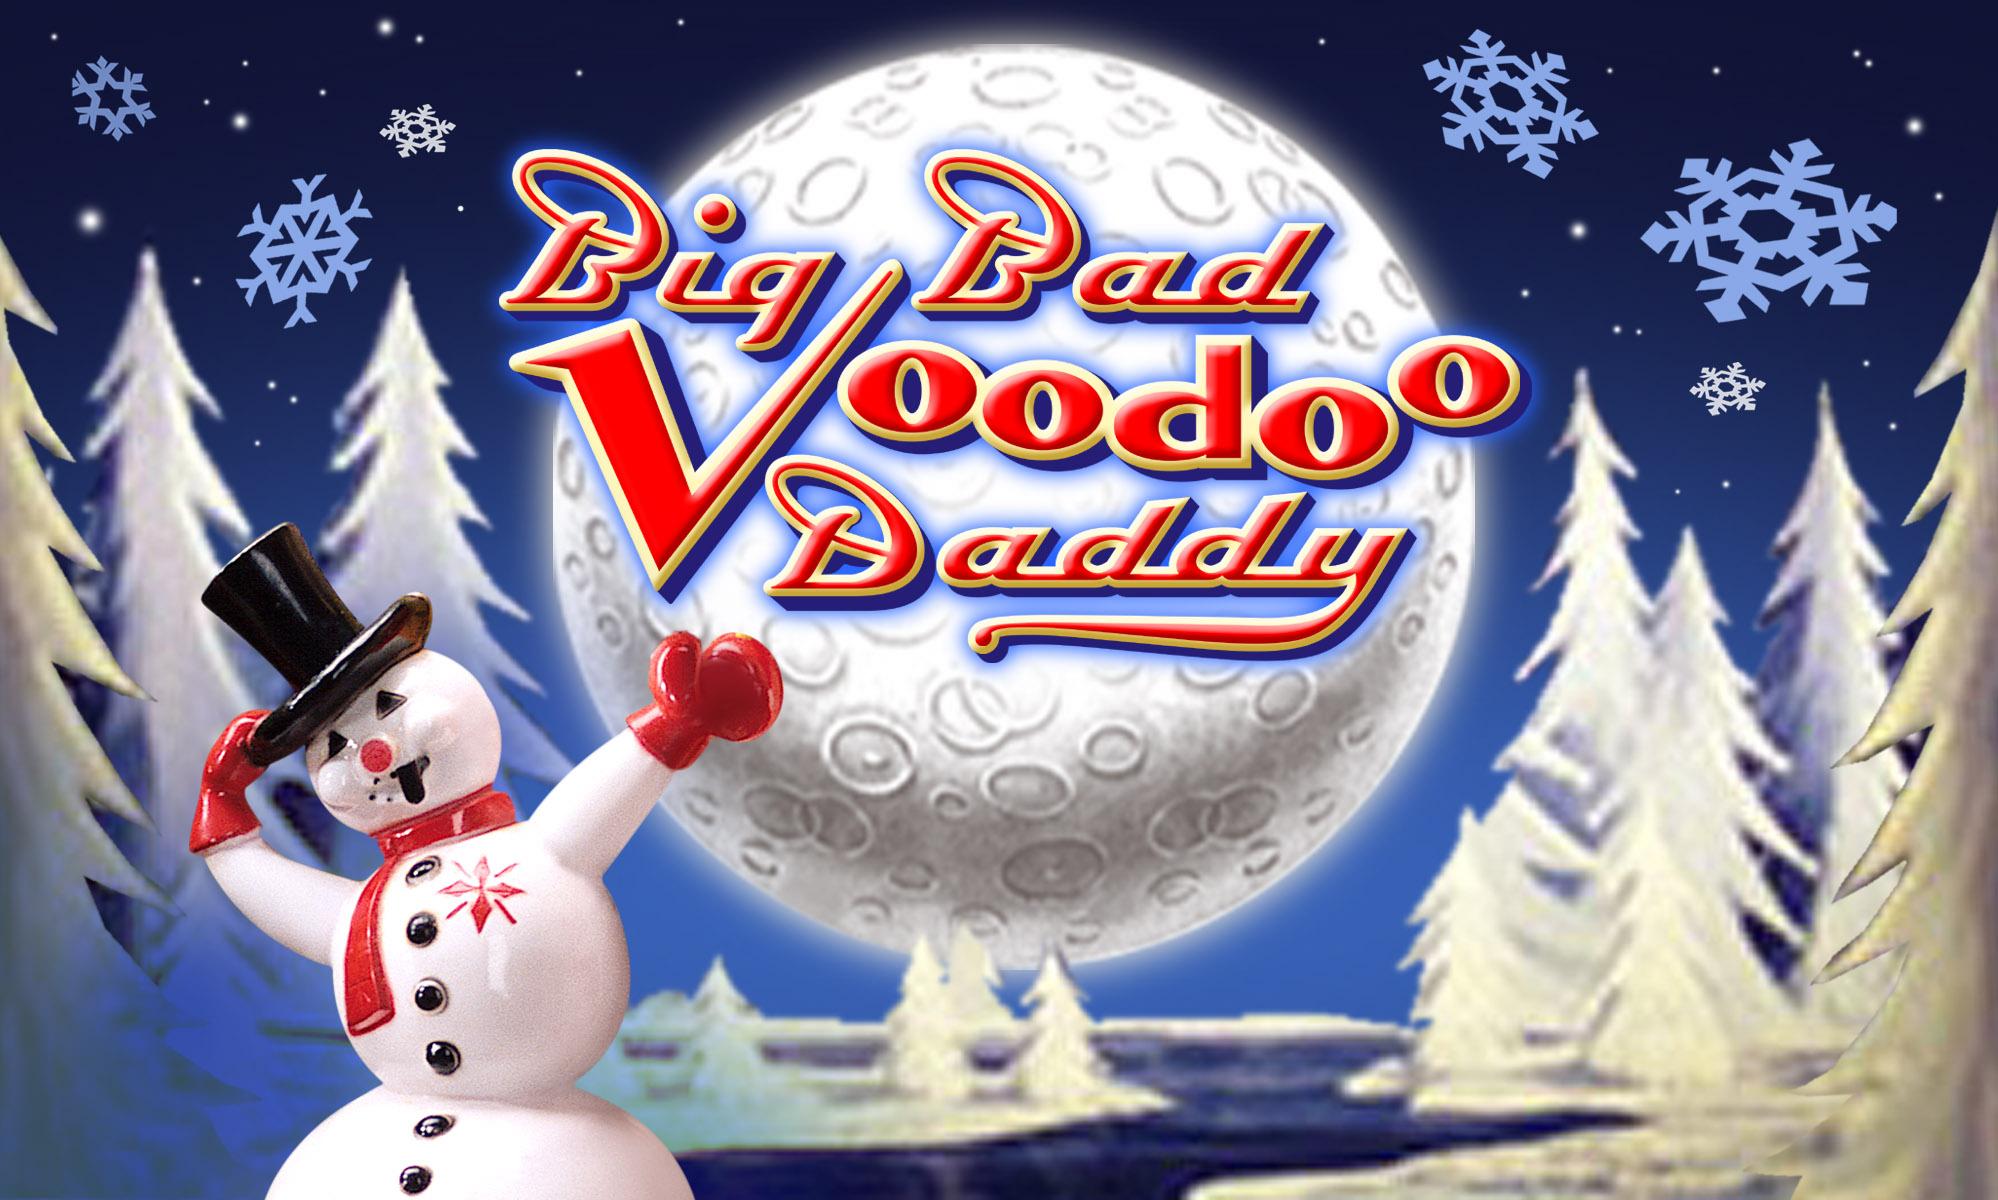 BBVD_ChristmasBackdrop_Full_r1.jpg